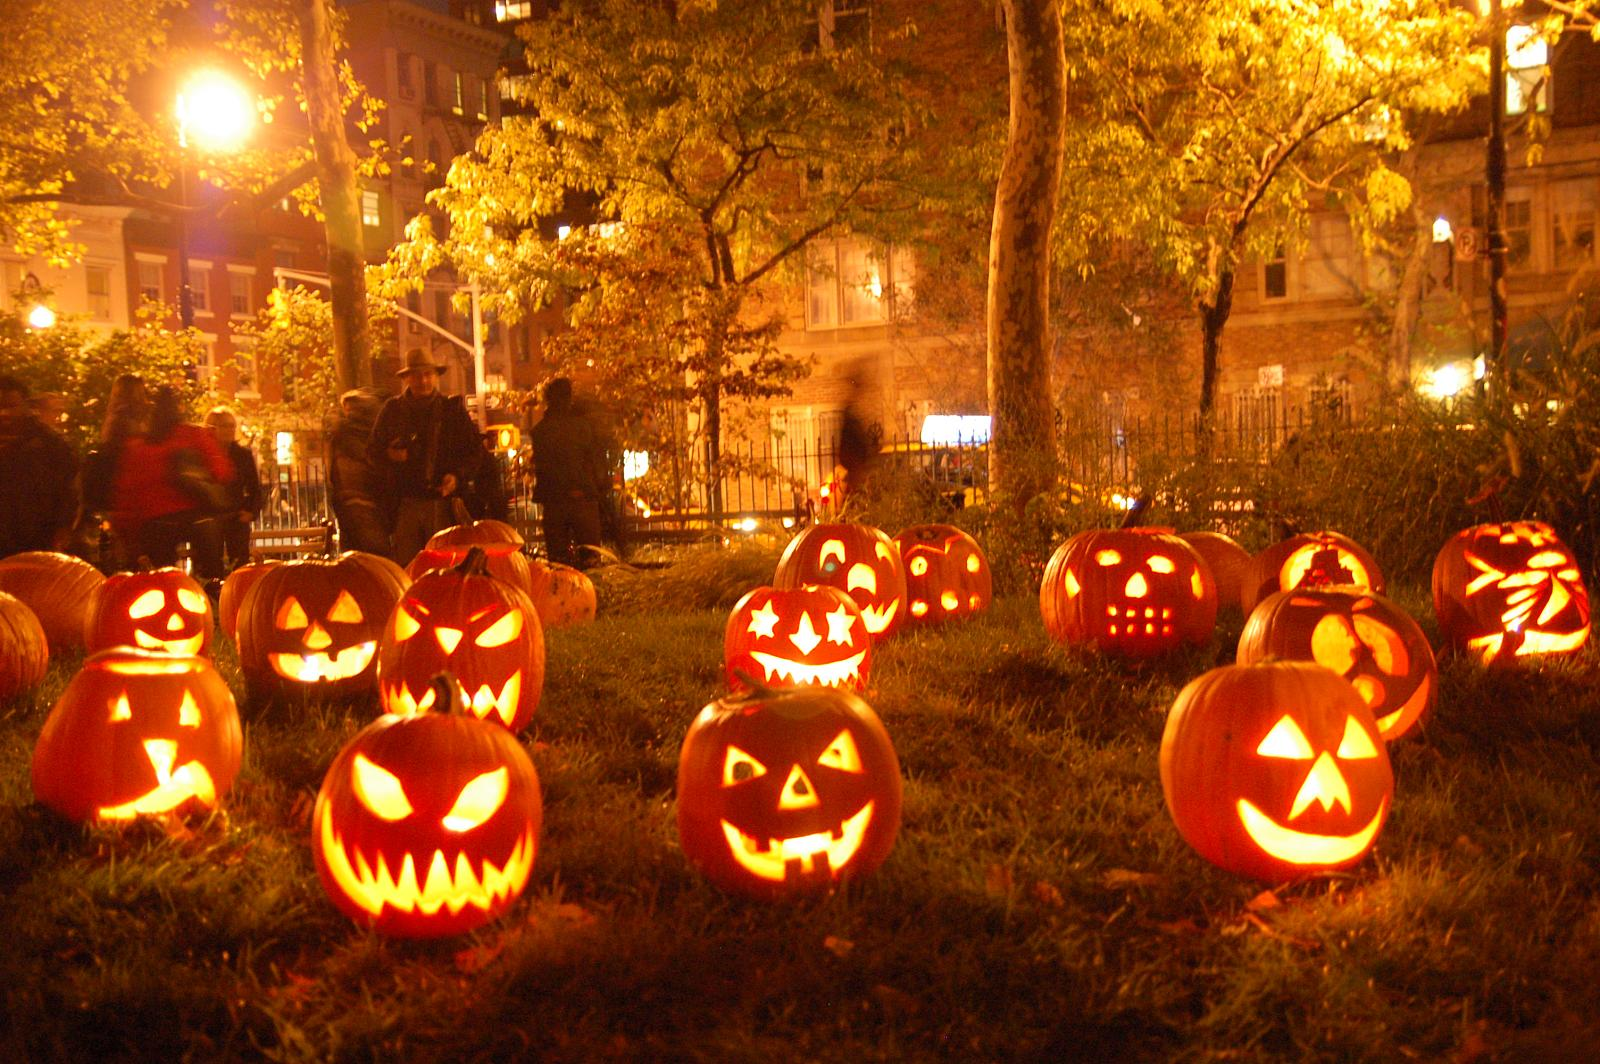 Jack-o'-lanterns adorning on Halloween